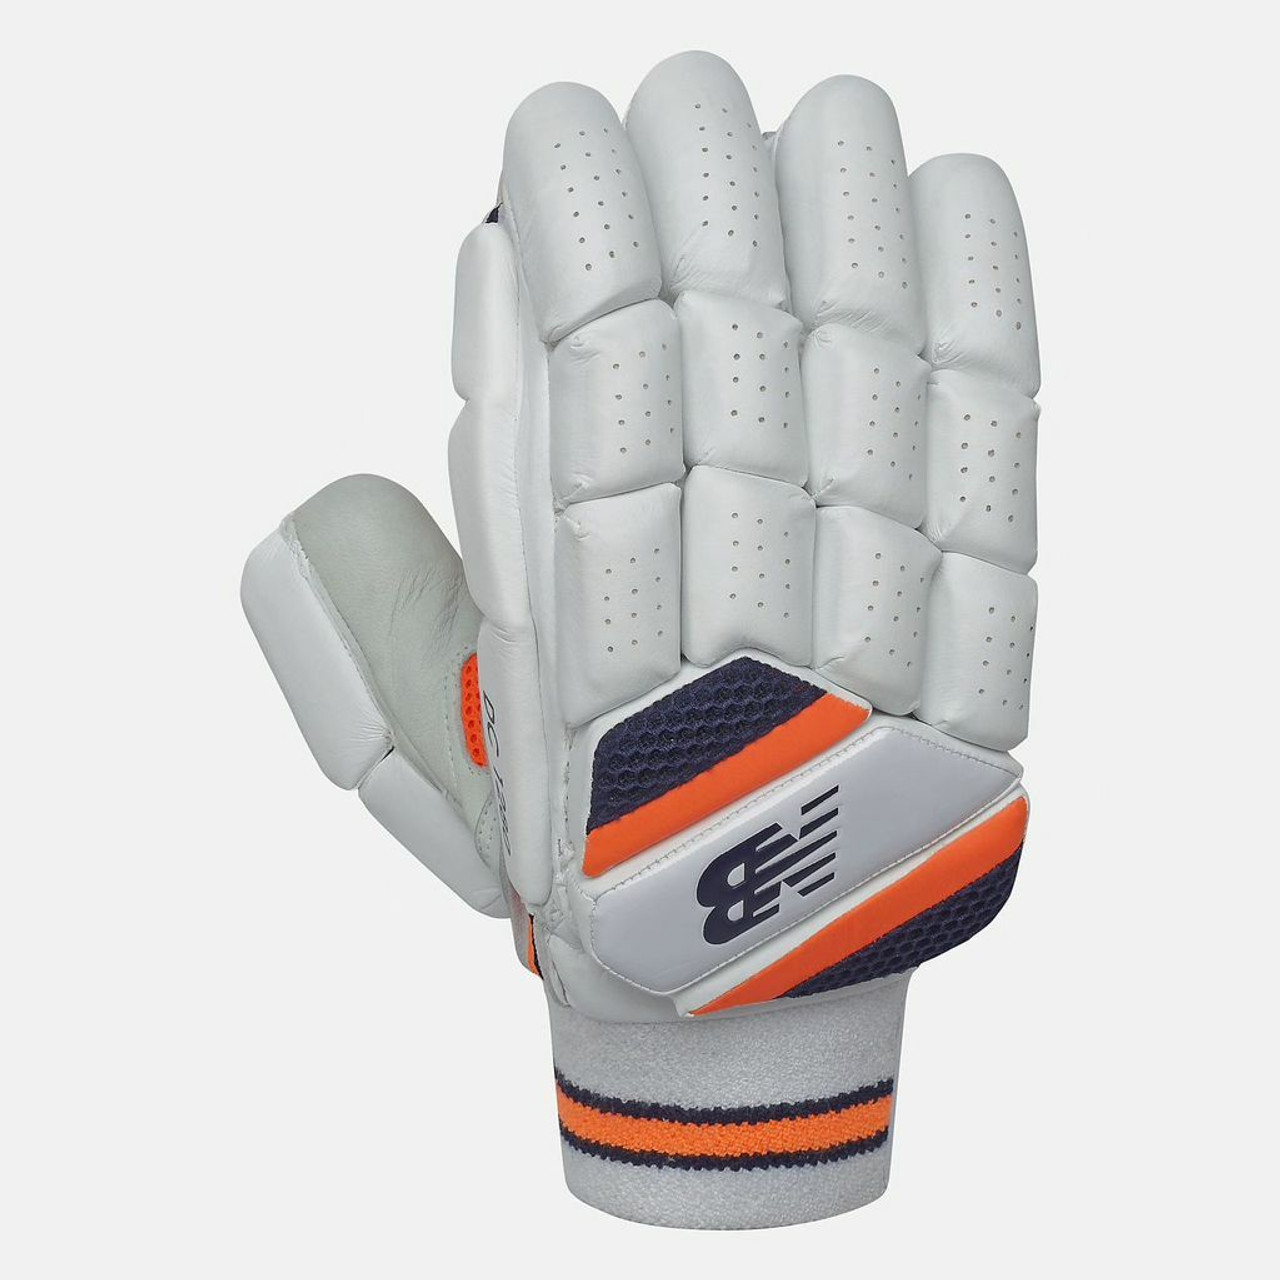 New Balance Batting Gloves